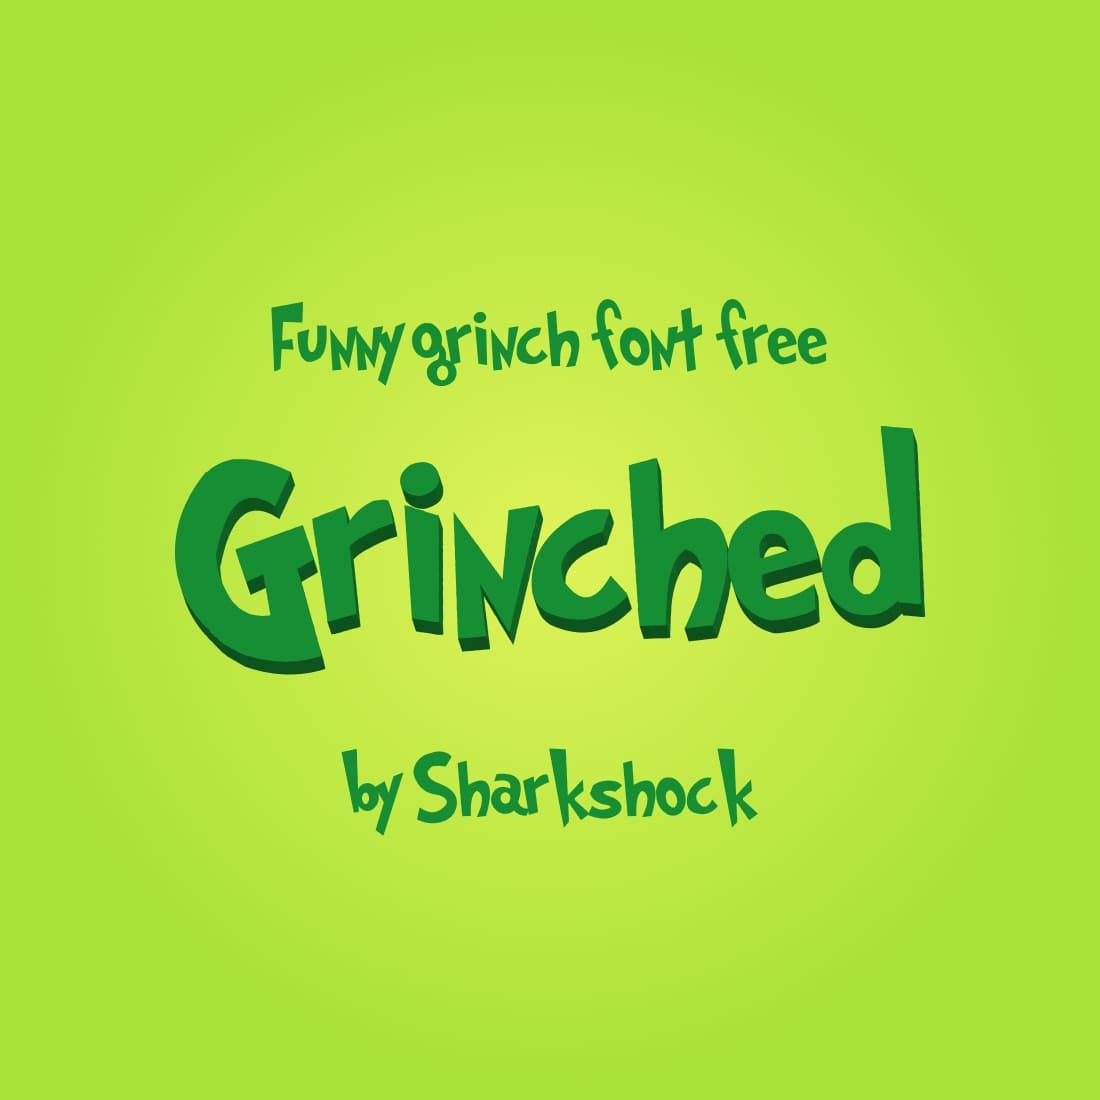 Main Image Funny grinch font free by MasterBundles.